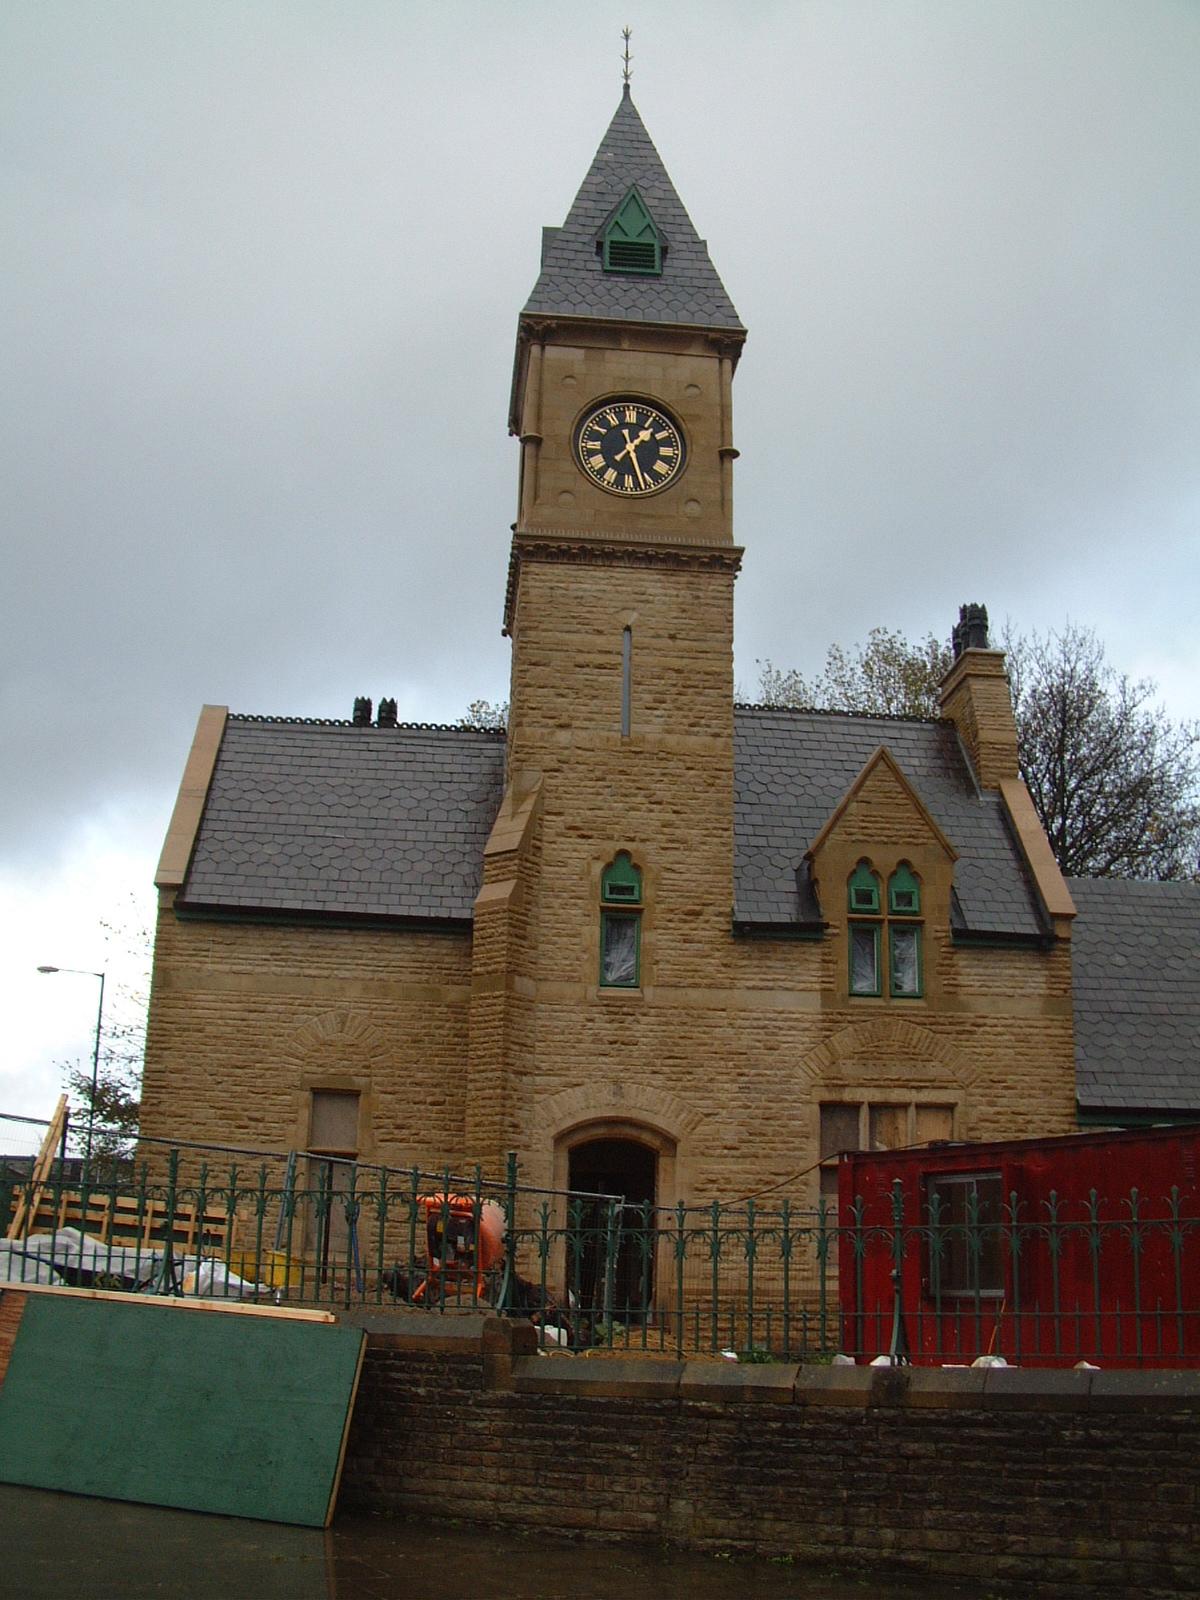 Exterior clock